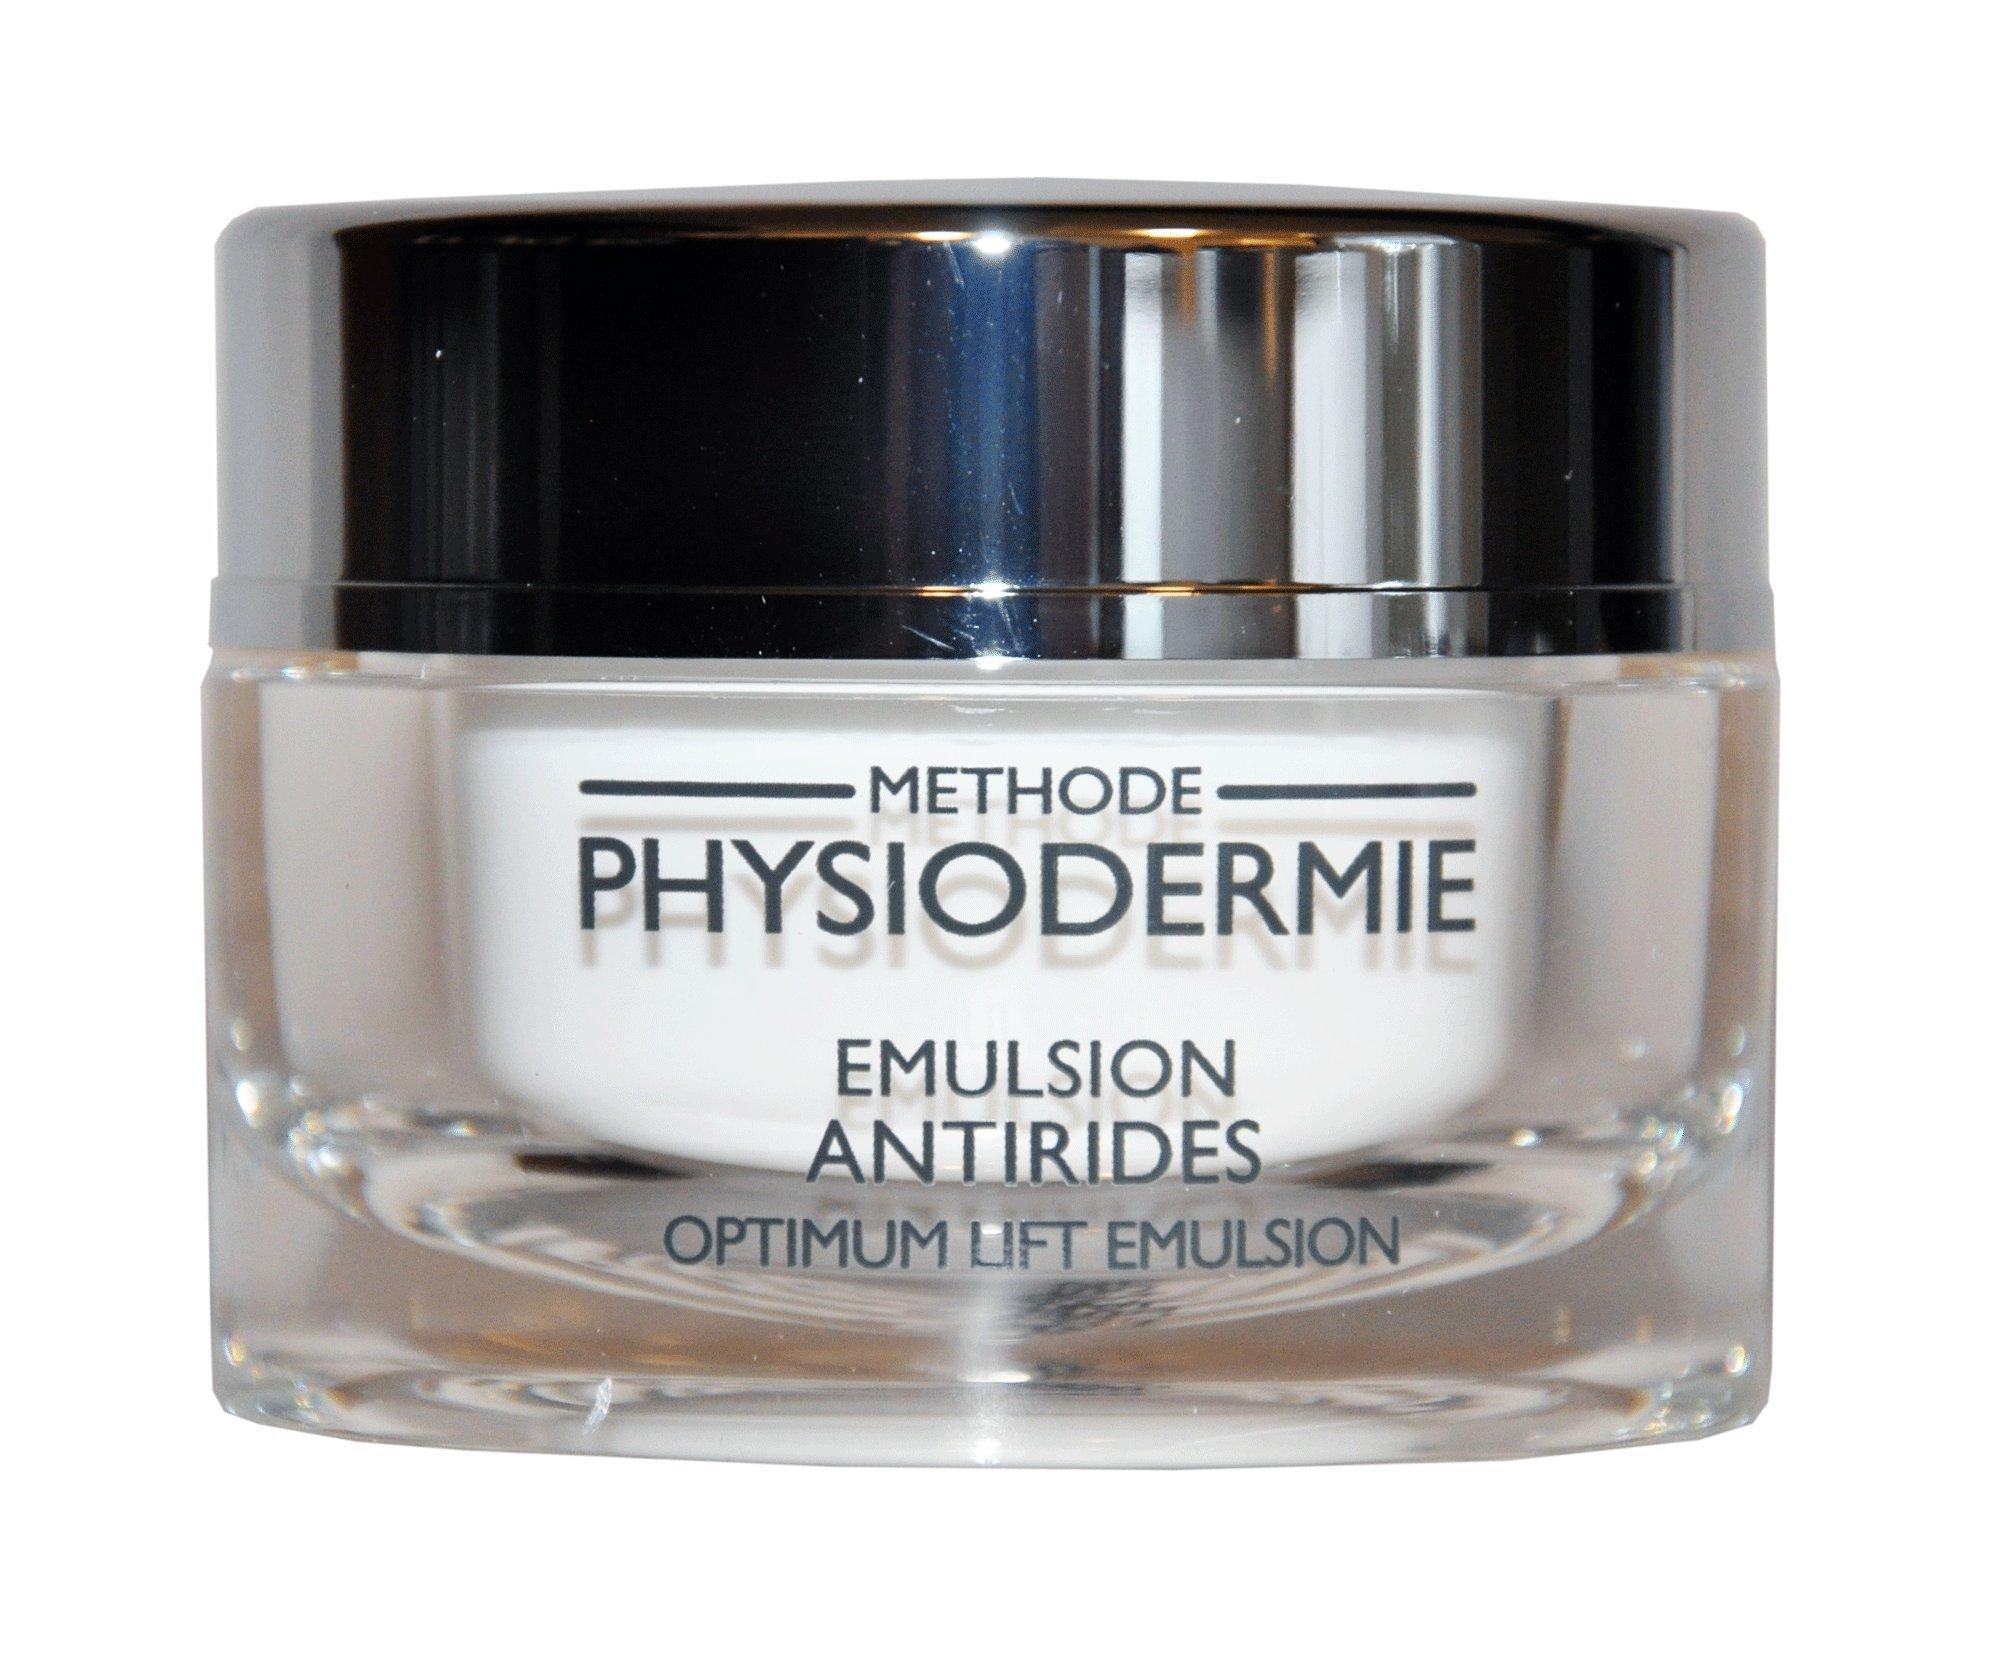 Physiodermie Optimum Lift Emulsion 1.7 fl.oz - BRAND NEW